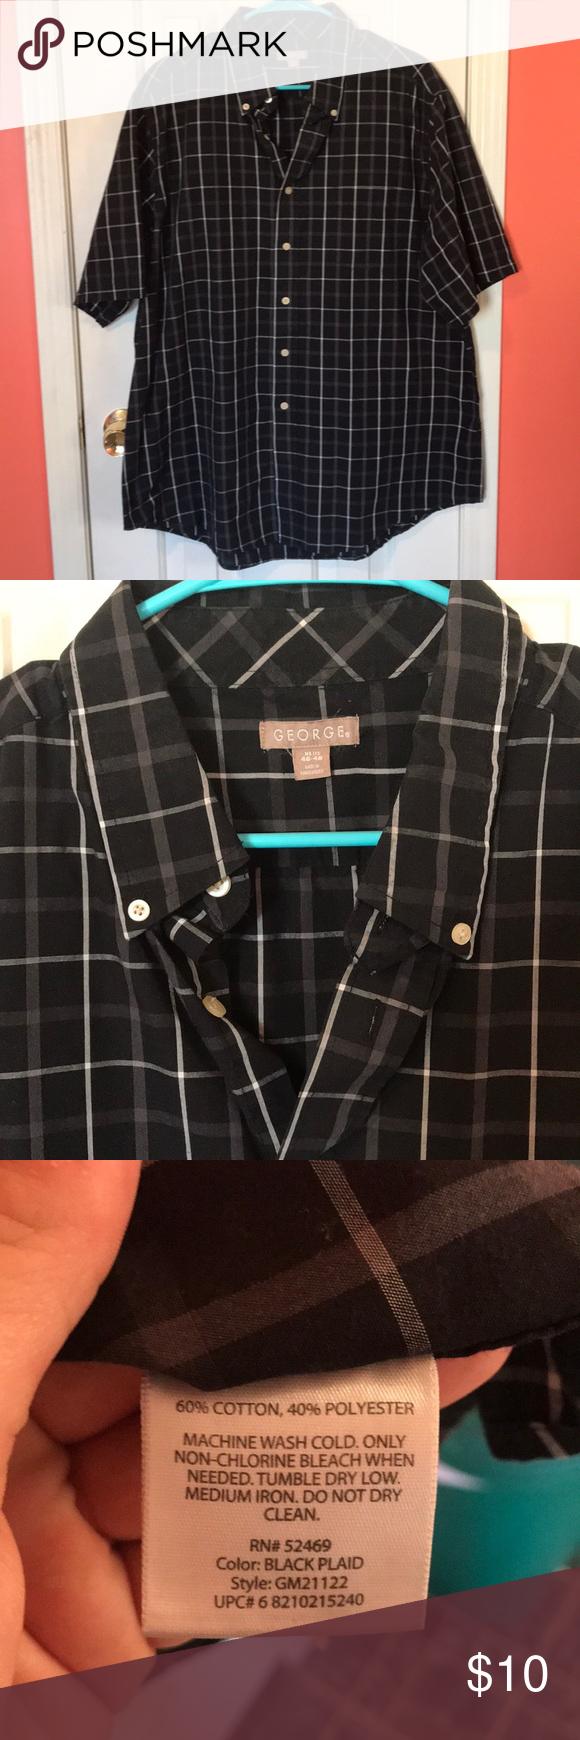 george shirts rn 52469